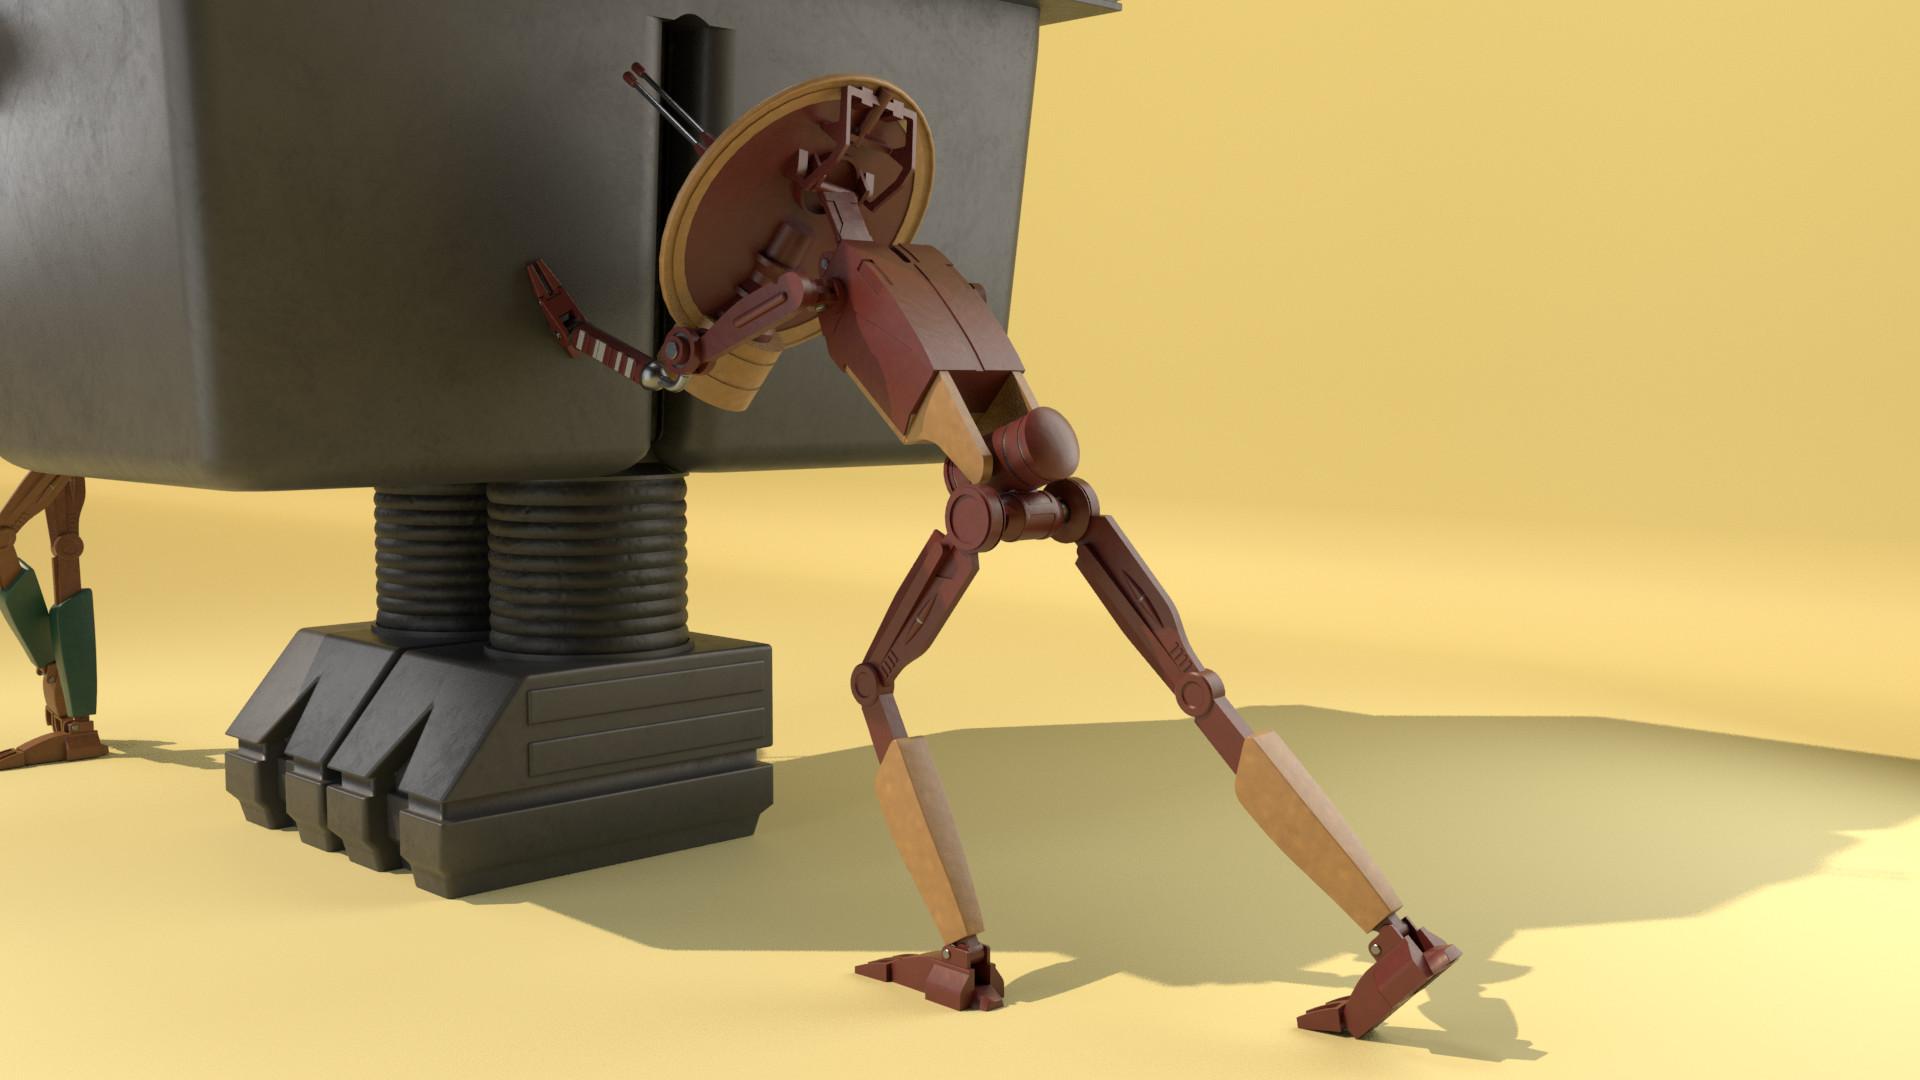 Andrew moore droids scene 4 0001